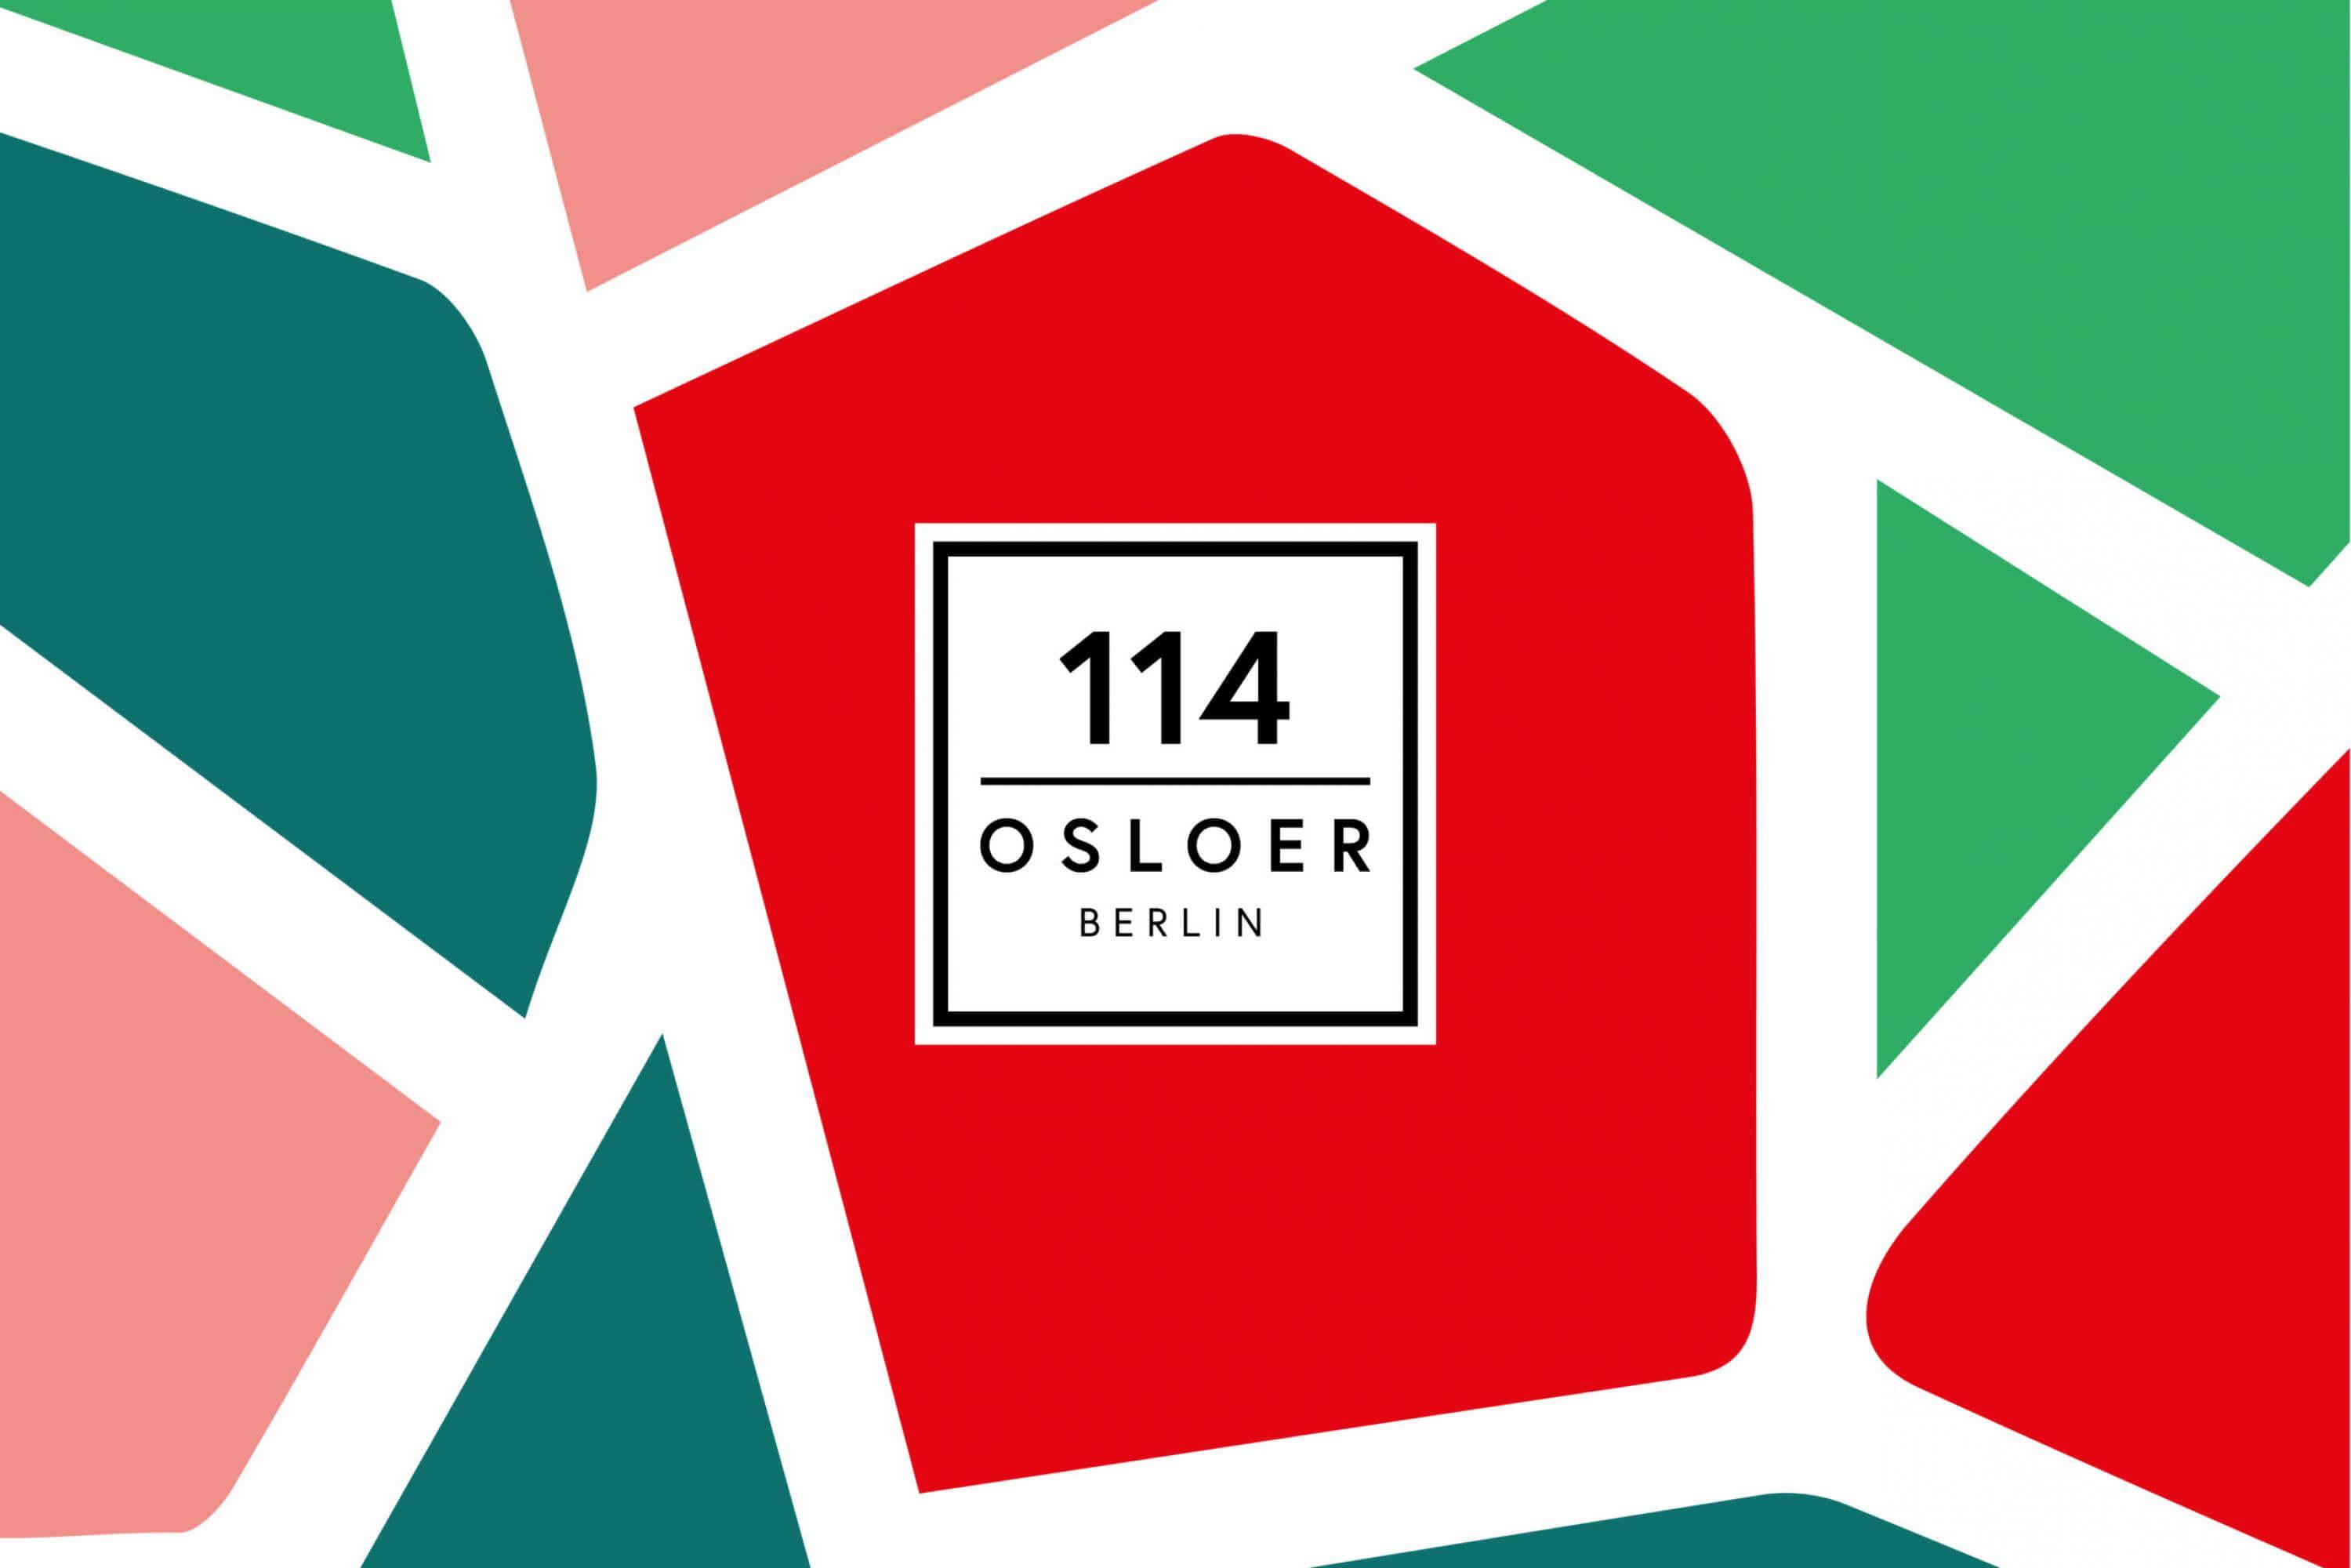 Osloer114-Logo-Gestaltung-Design-Trendcity-Immobilien-FORMLOS-Berlin